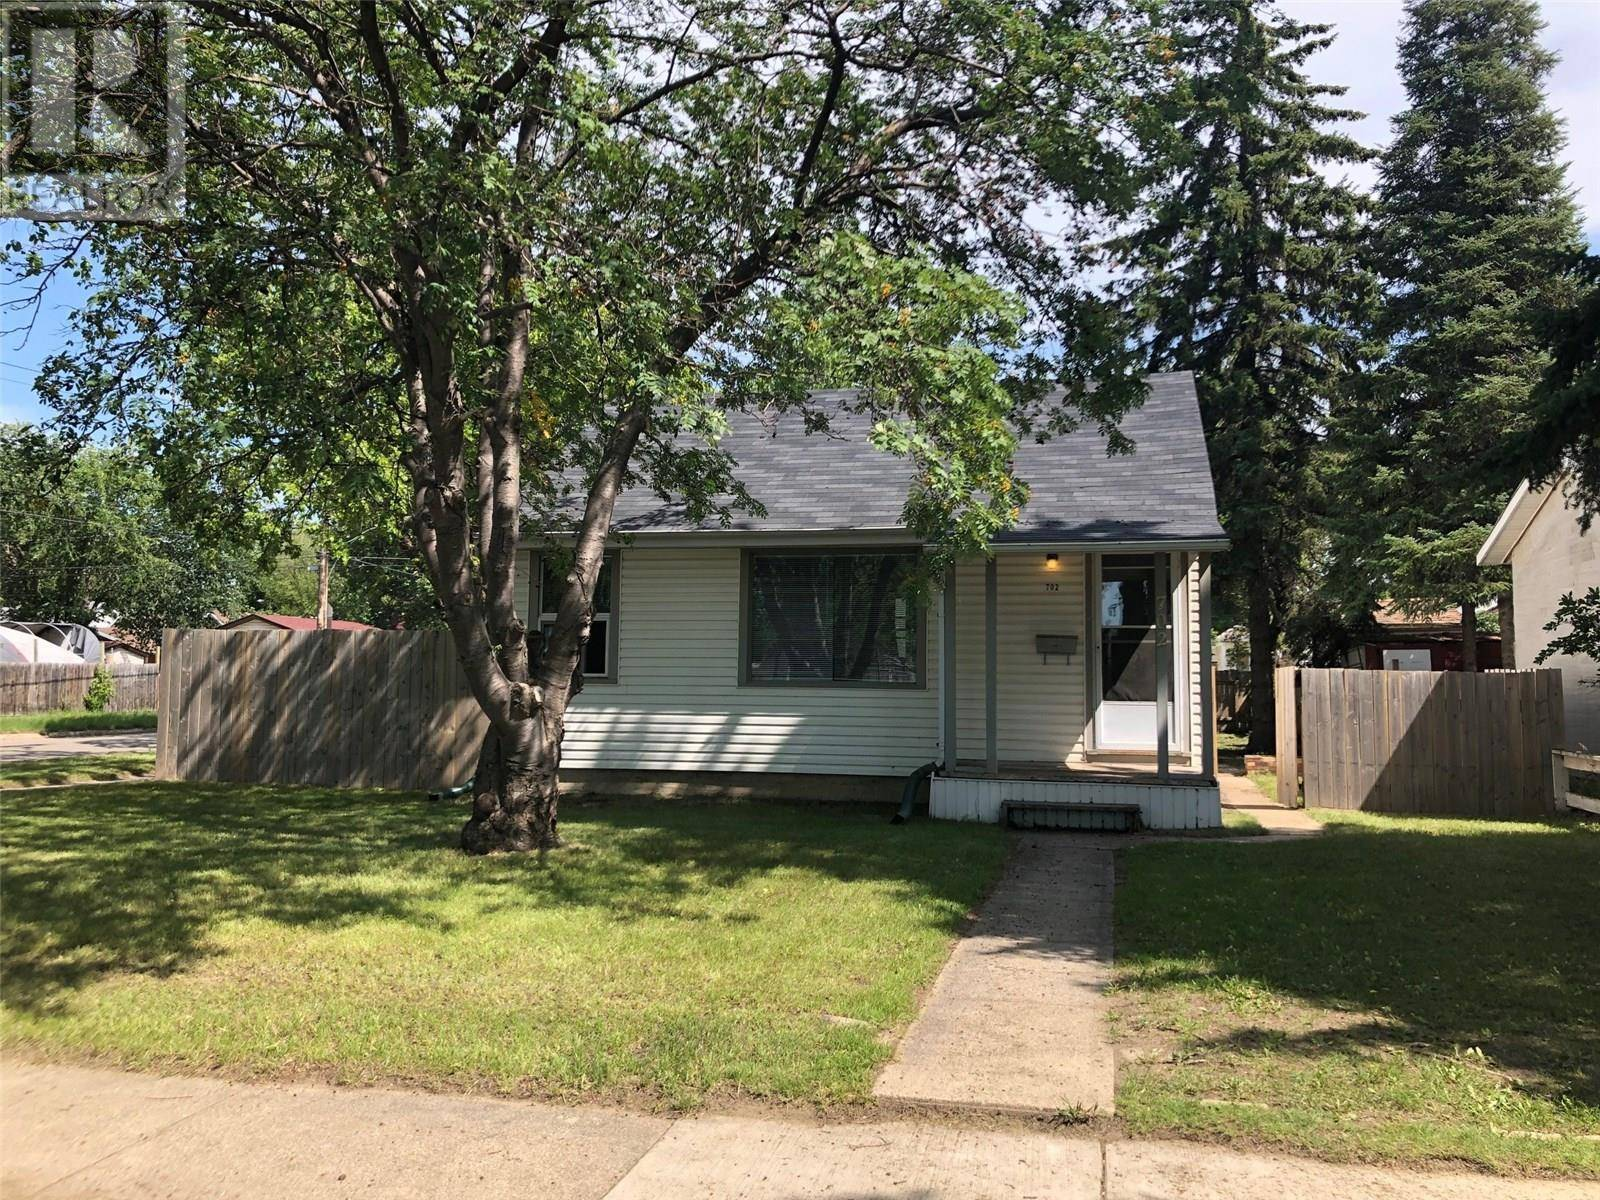 House for sale at 702 K Ave S Saskatoon Saskatchewan - MLS: SK783750